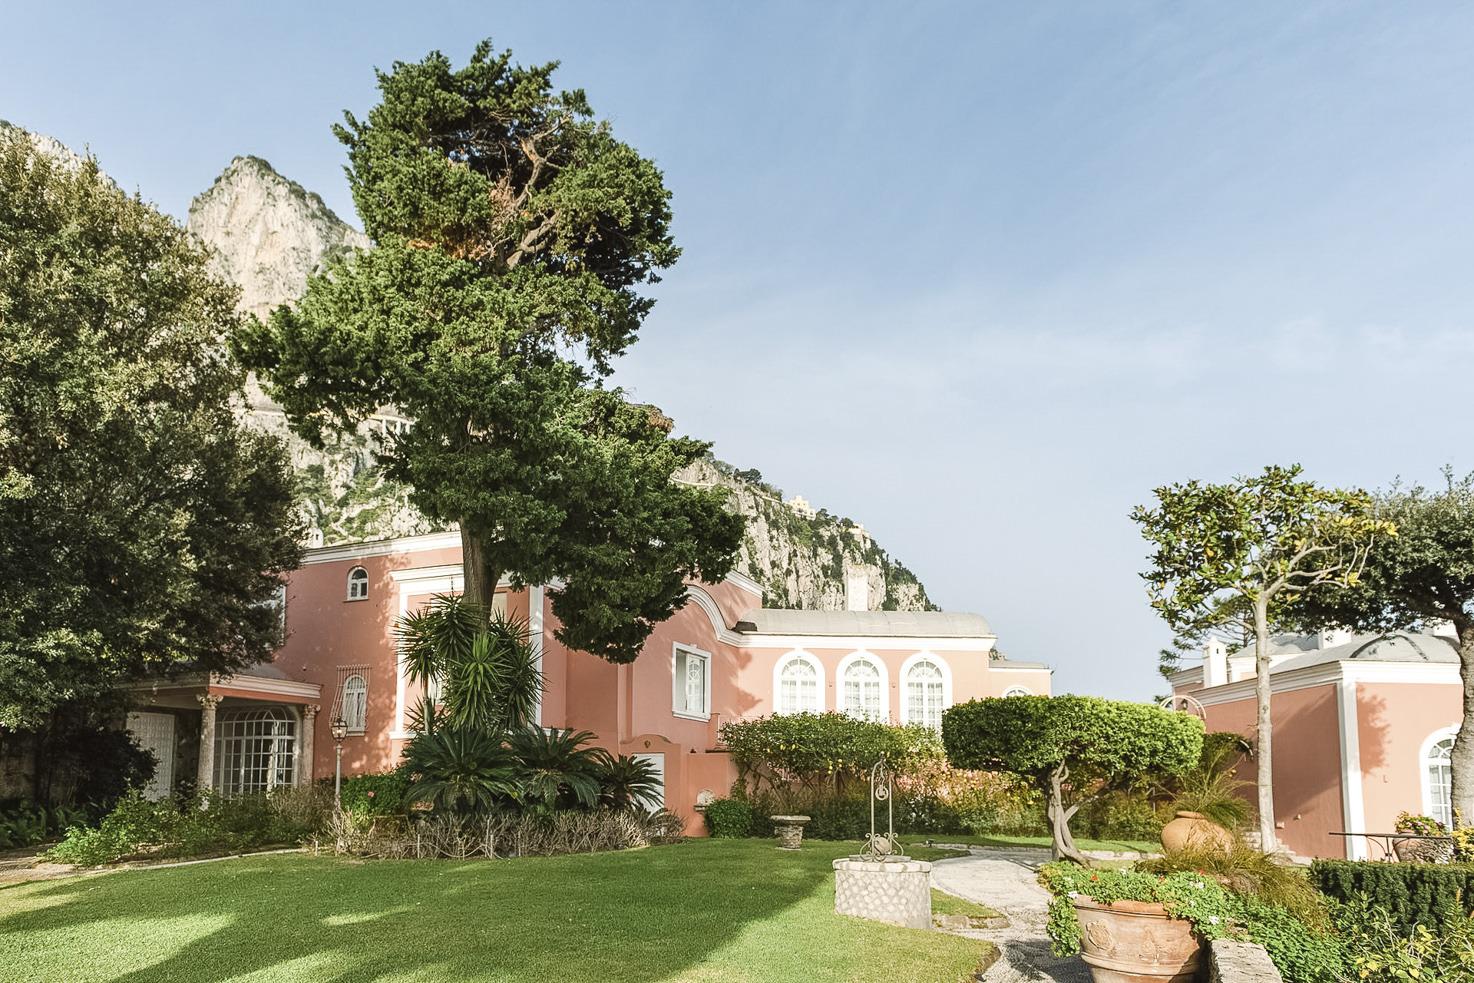 Exterior view of Villa Camelia